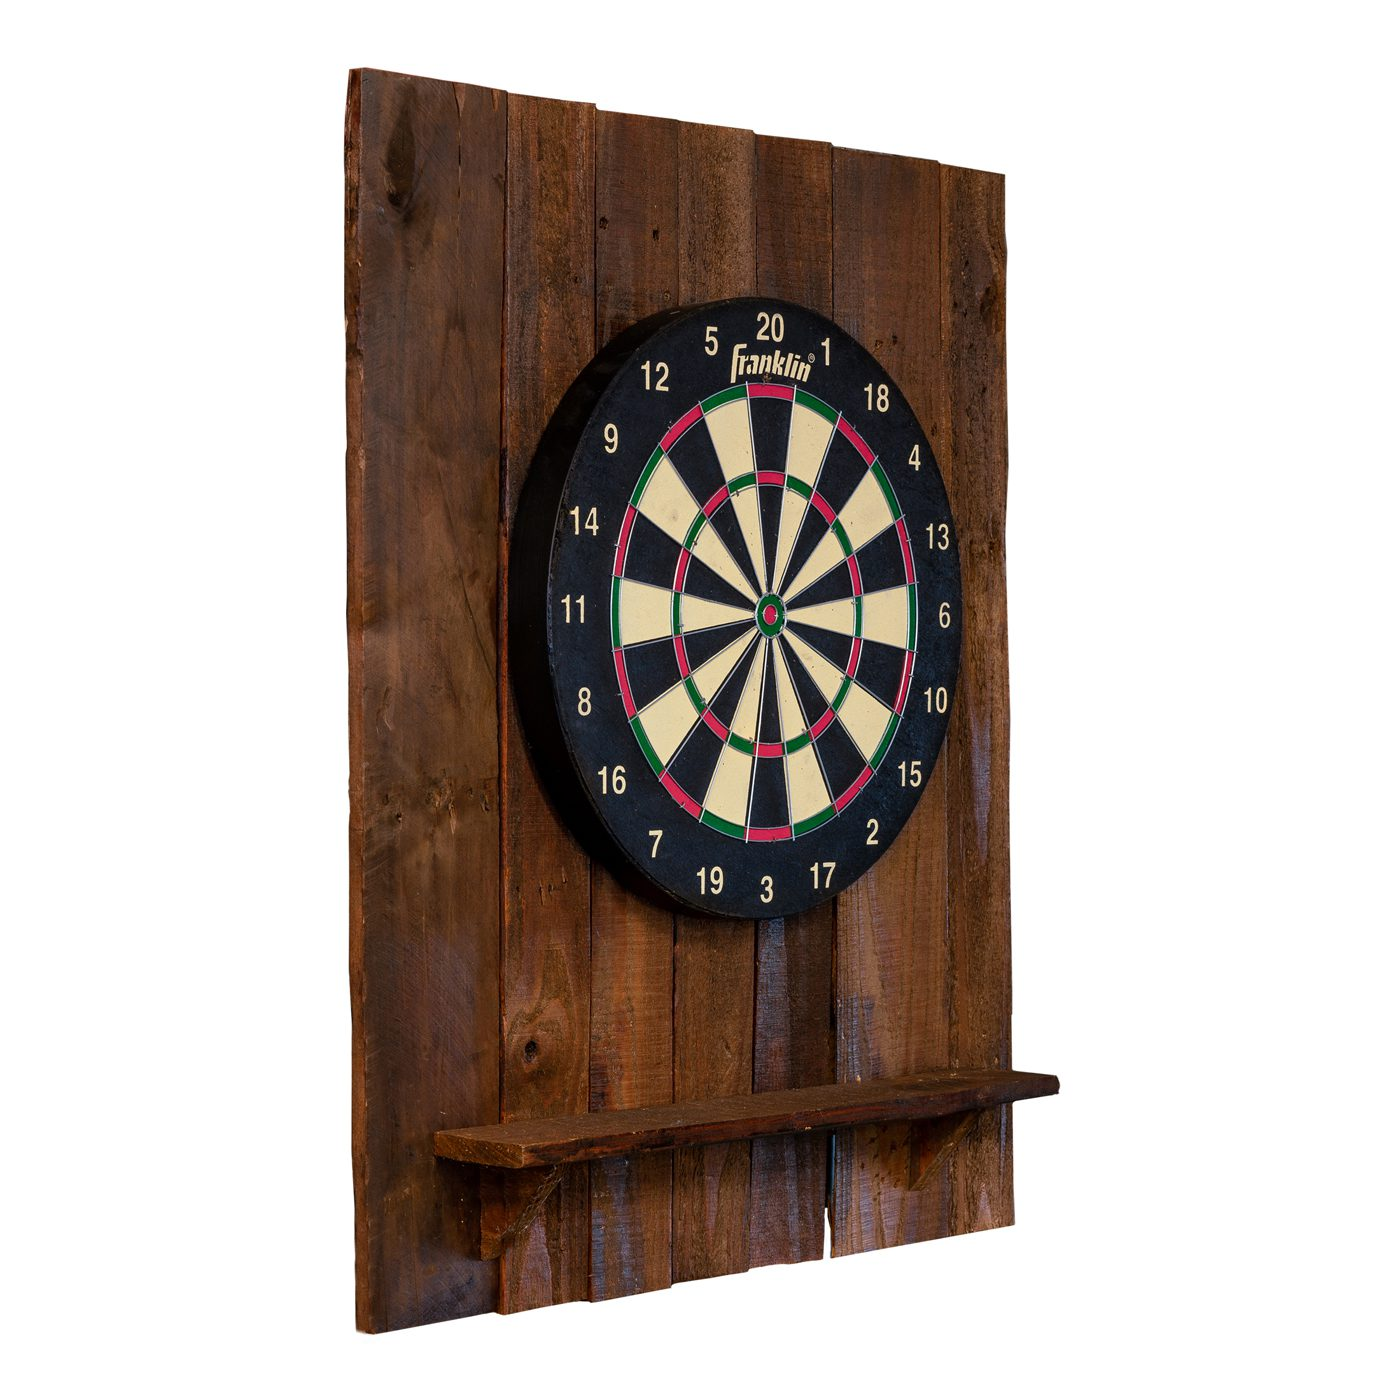 Reclaimed Wood Dartboard Backing with English Board